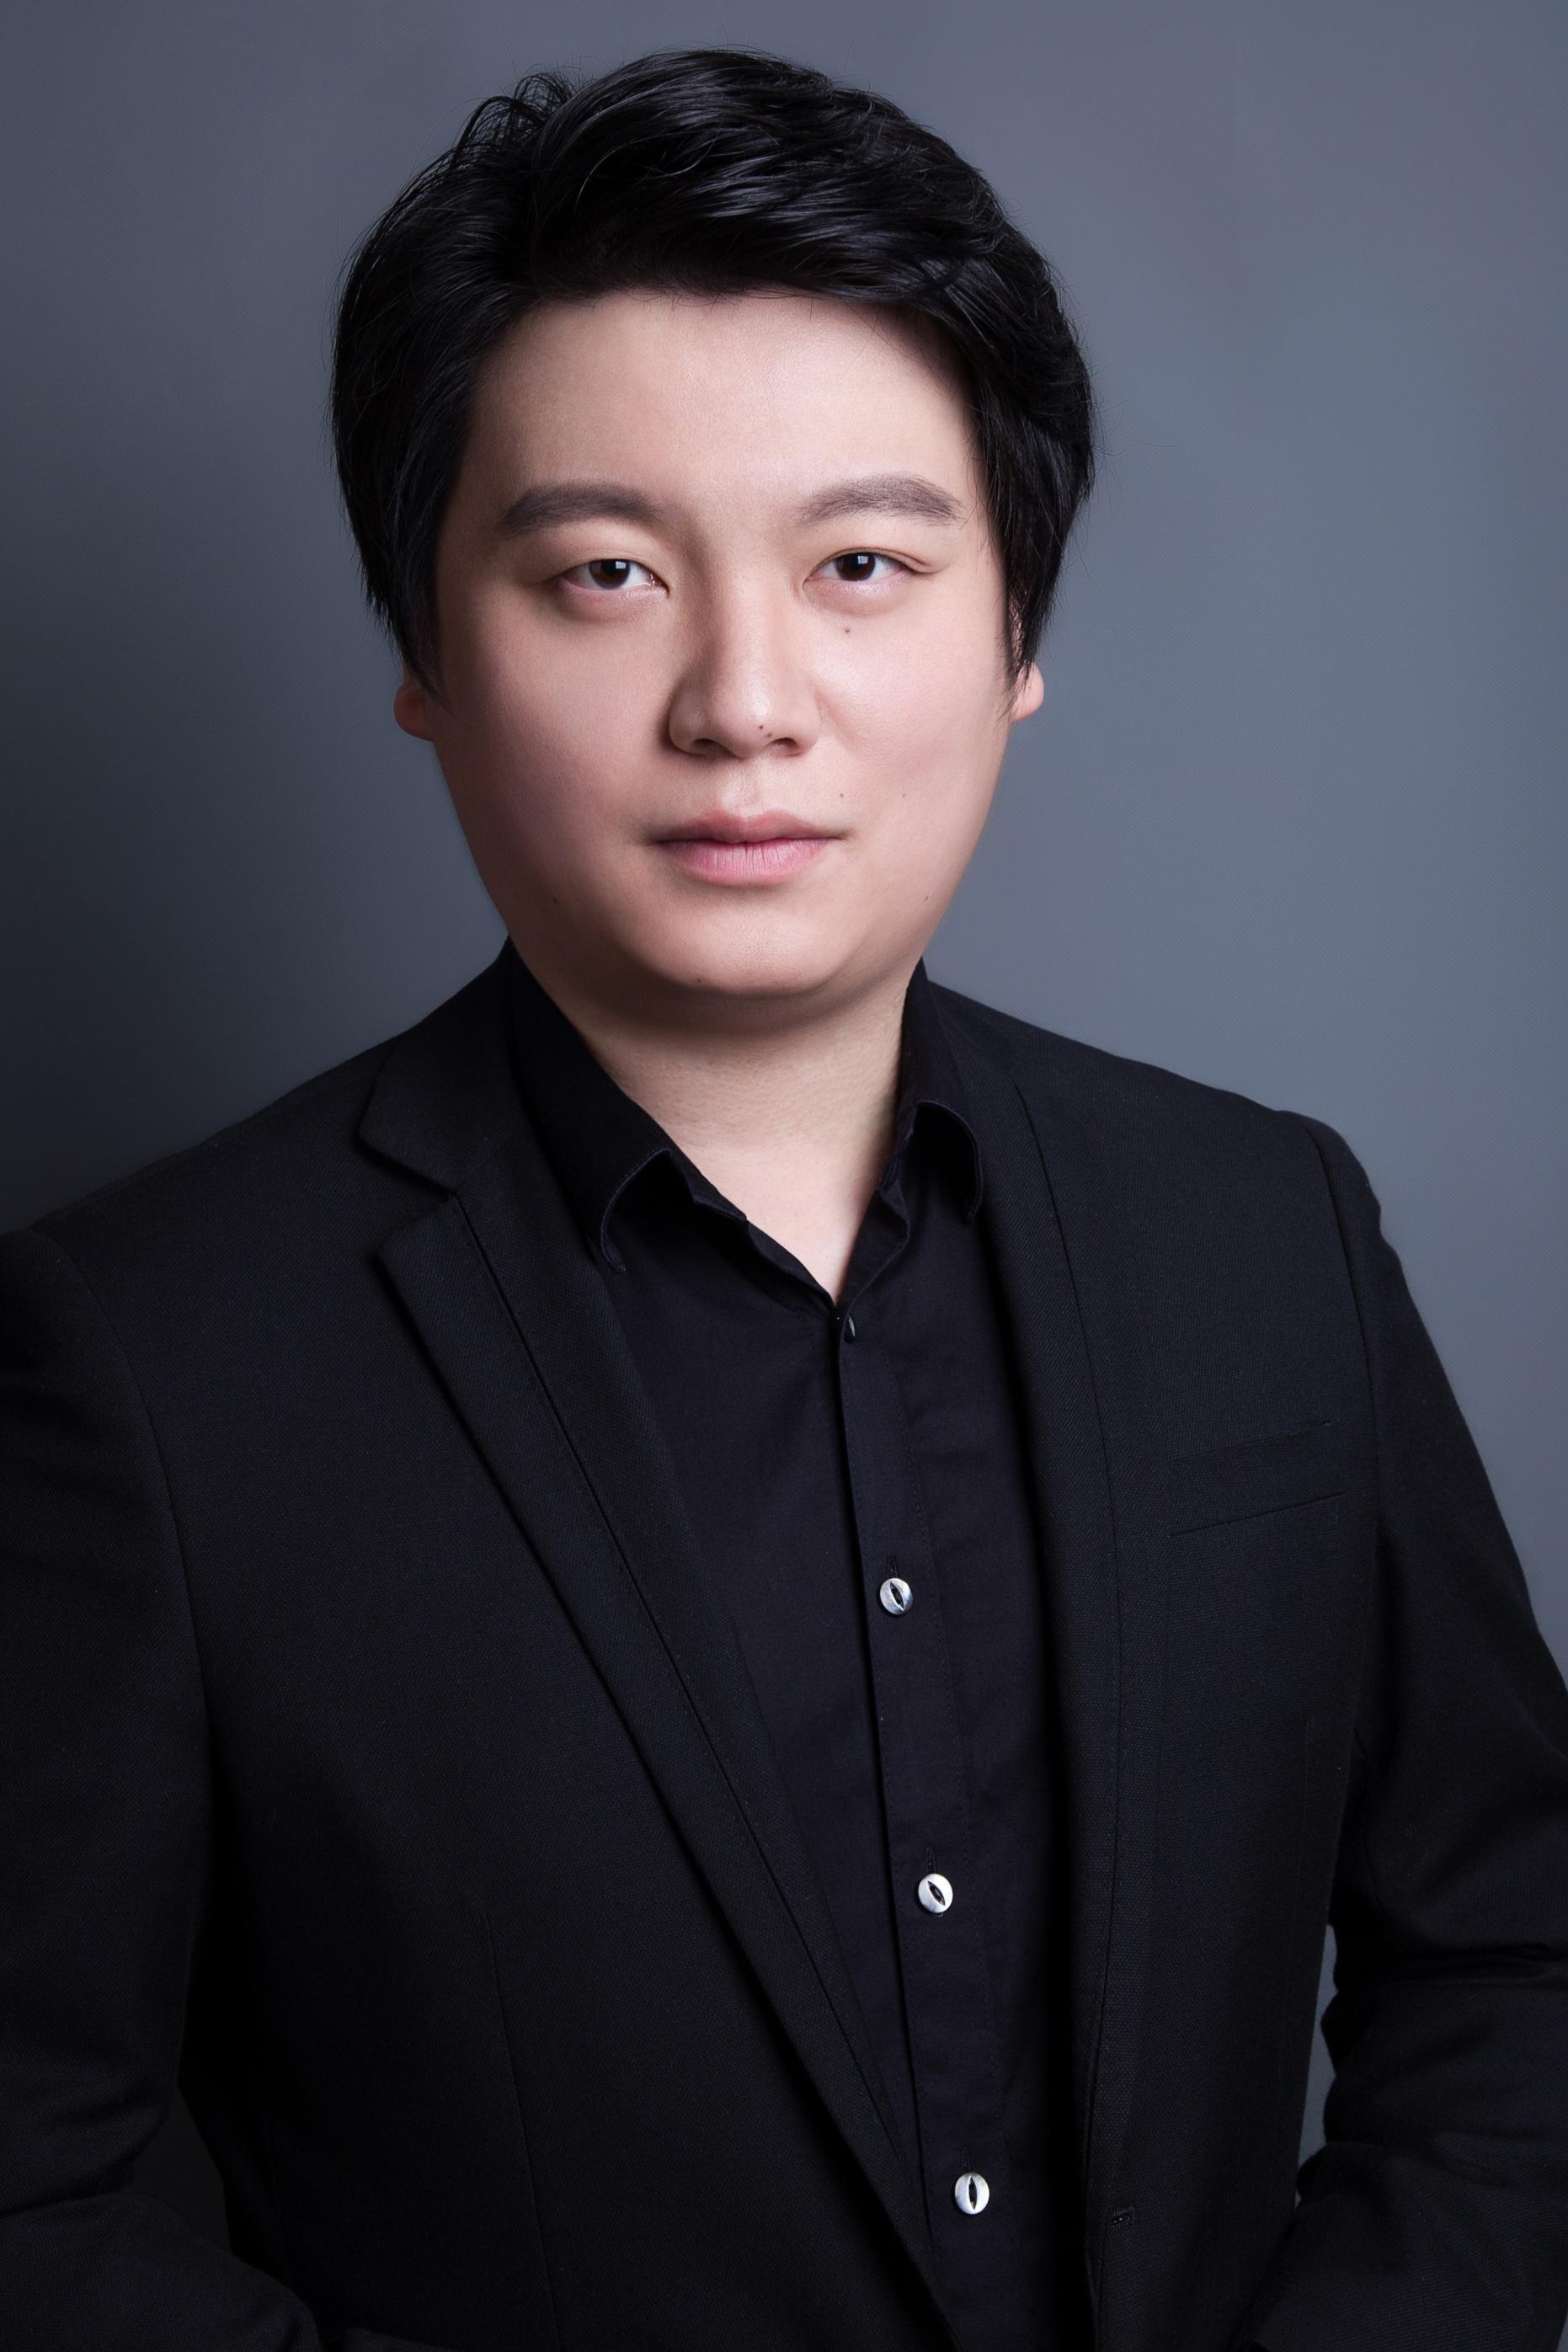 *Yongxi Chen, tenor